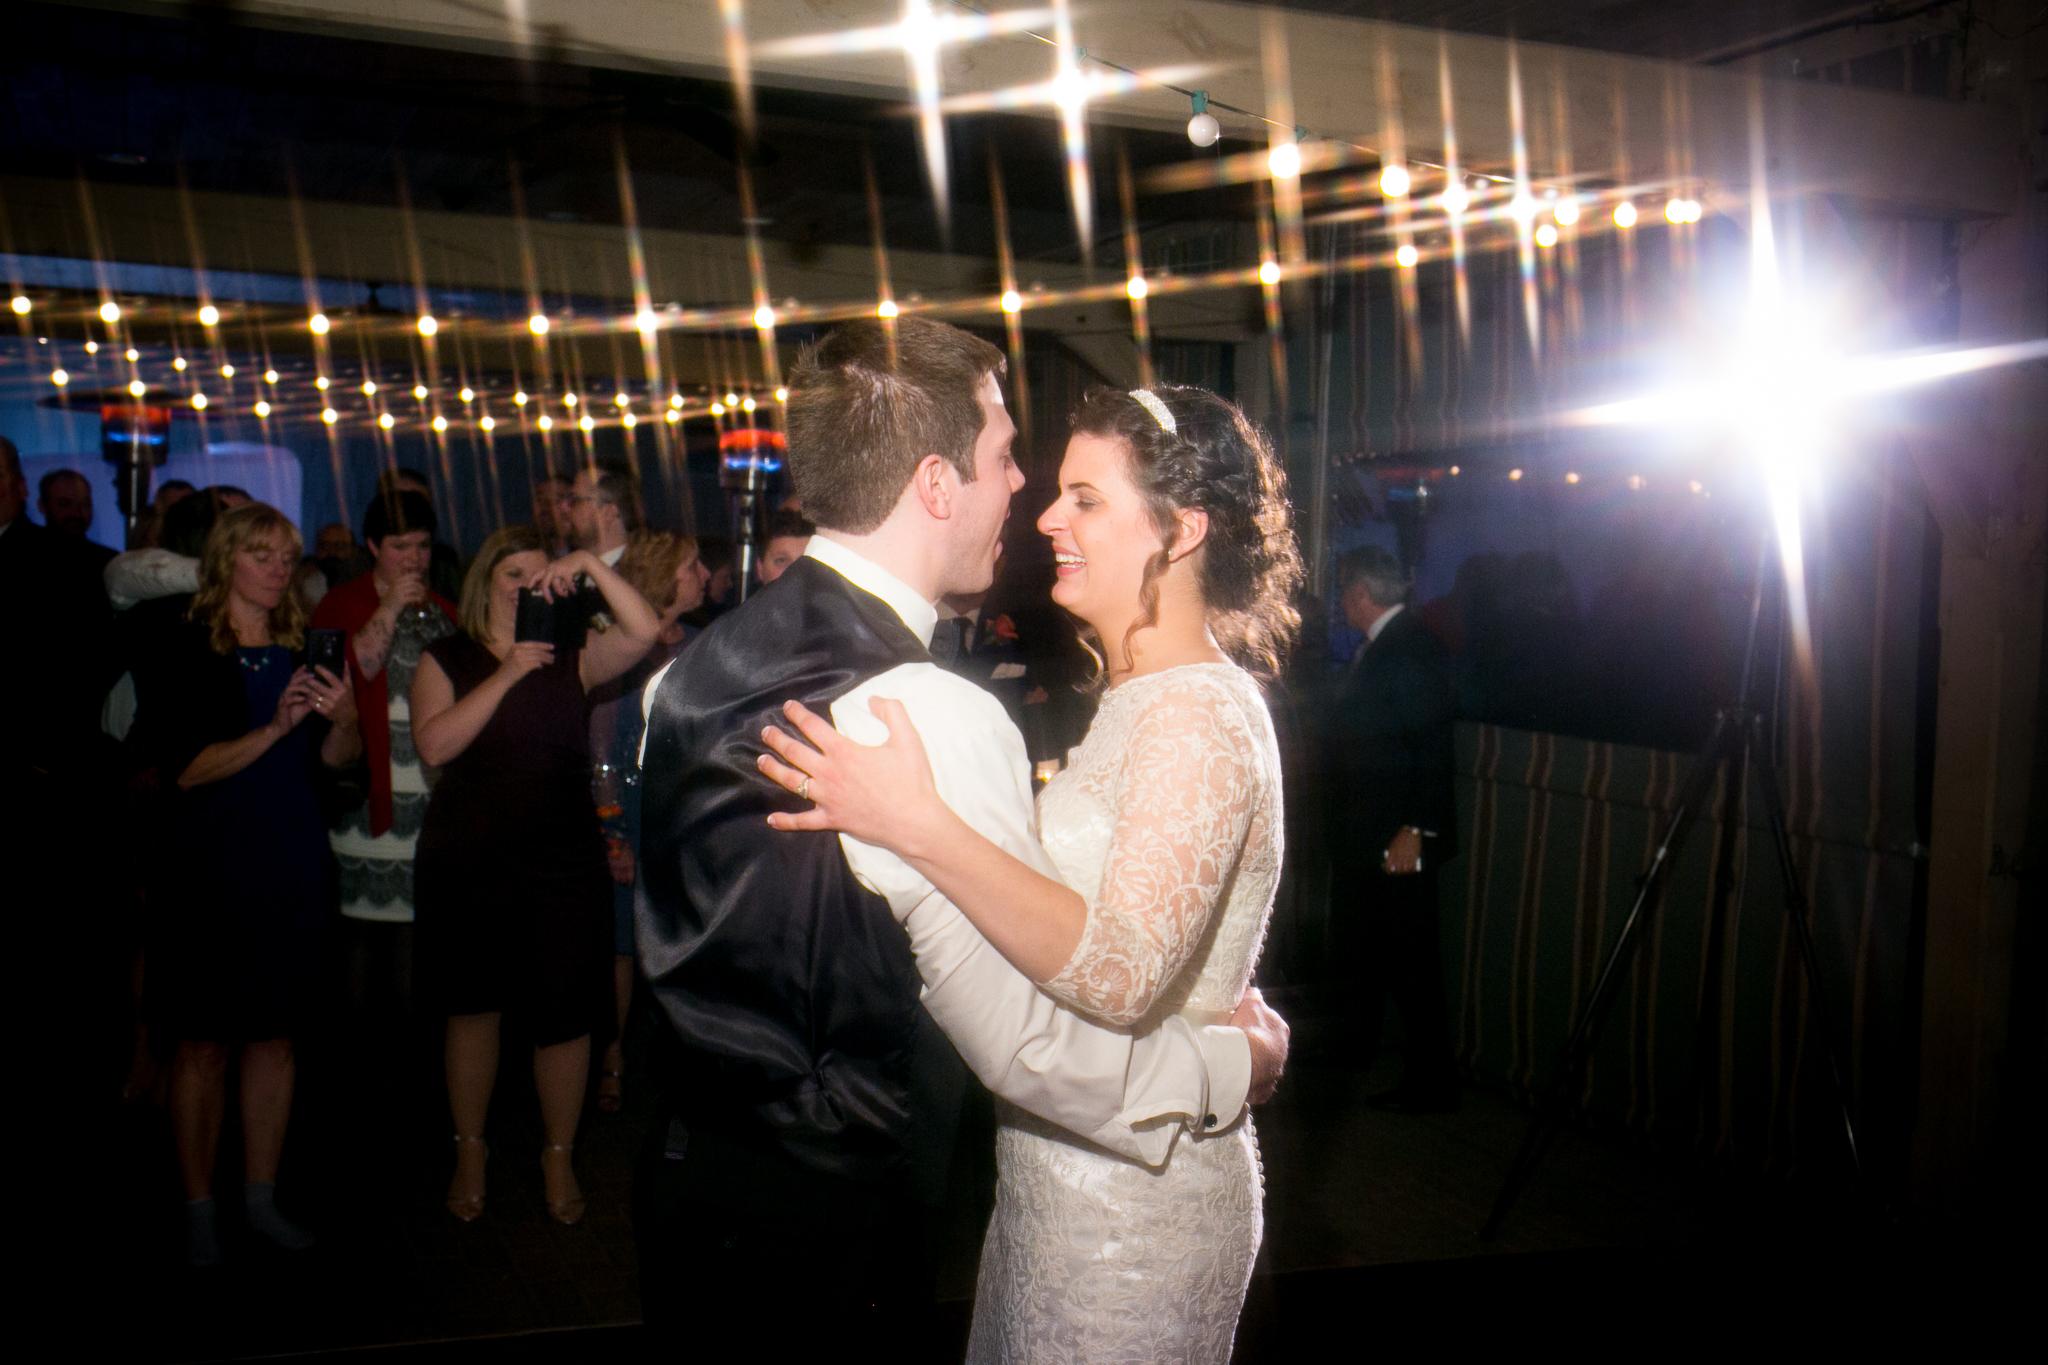 camuglia-whomstudio-chelsea_and_andy-nycphotographer-wedding-brooklyn-buffalo-timberlodge-115-5603.jpg